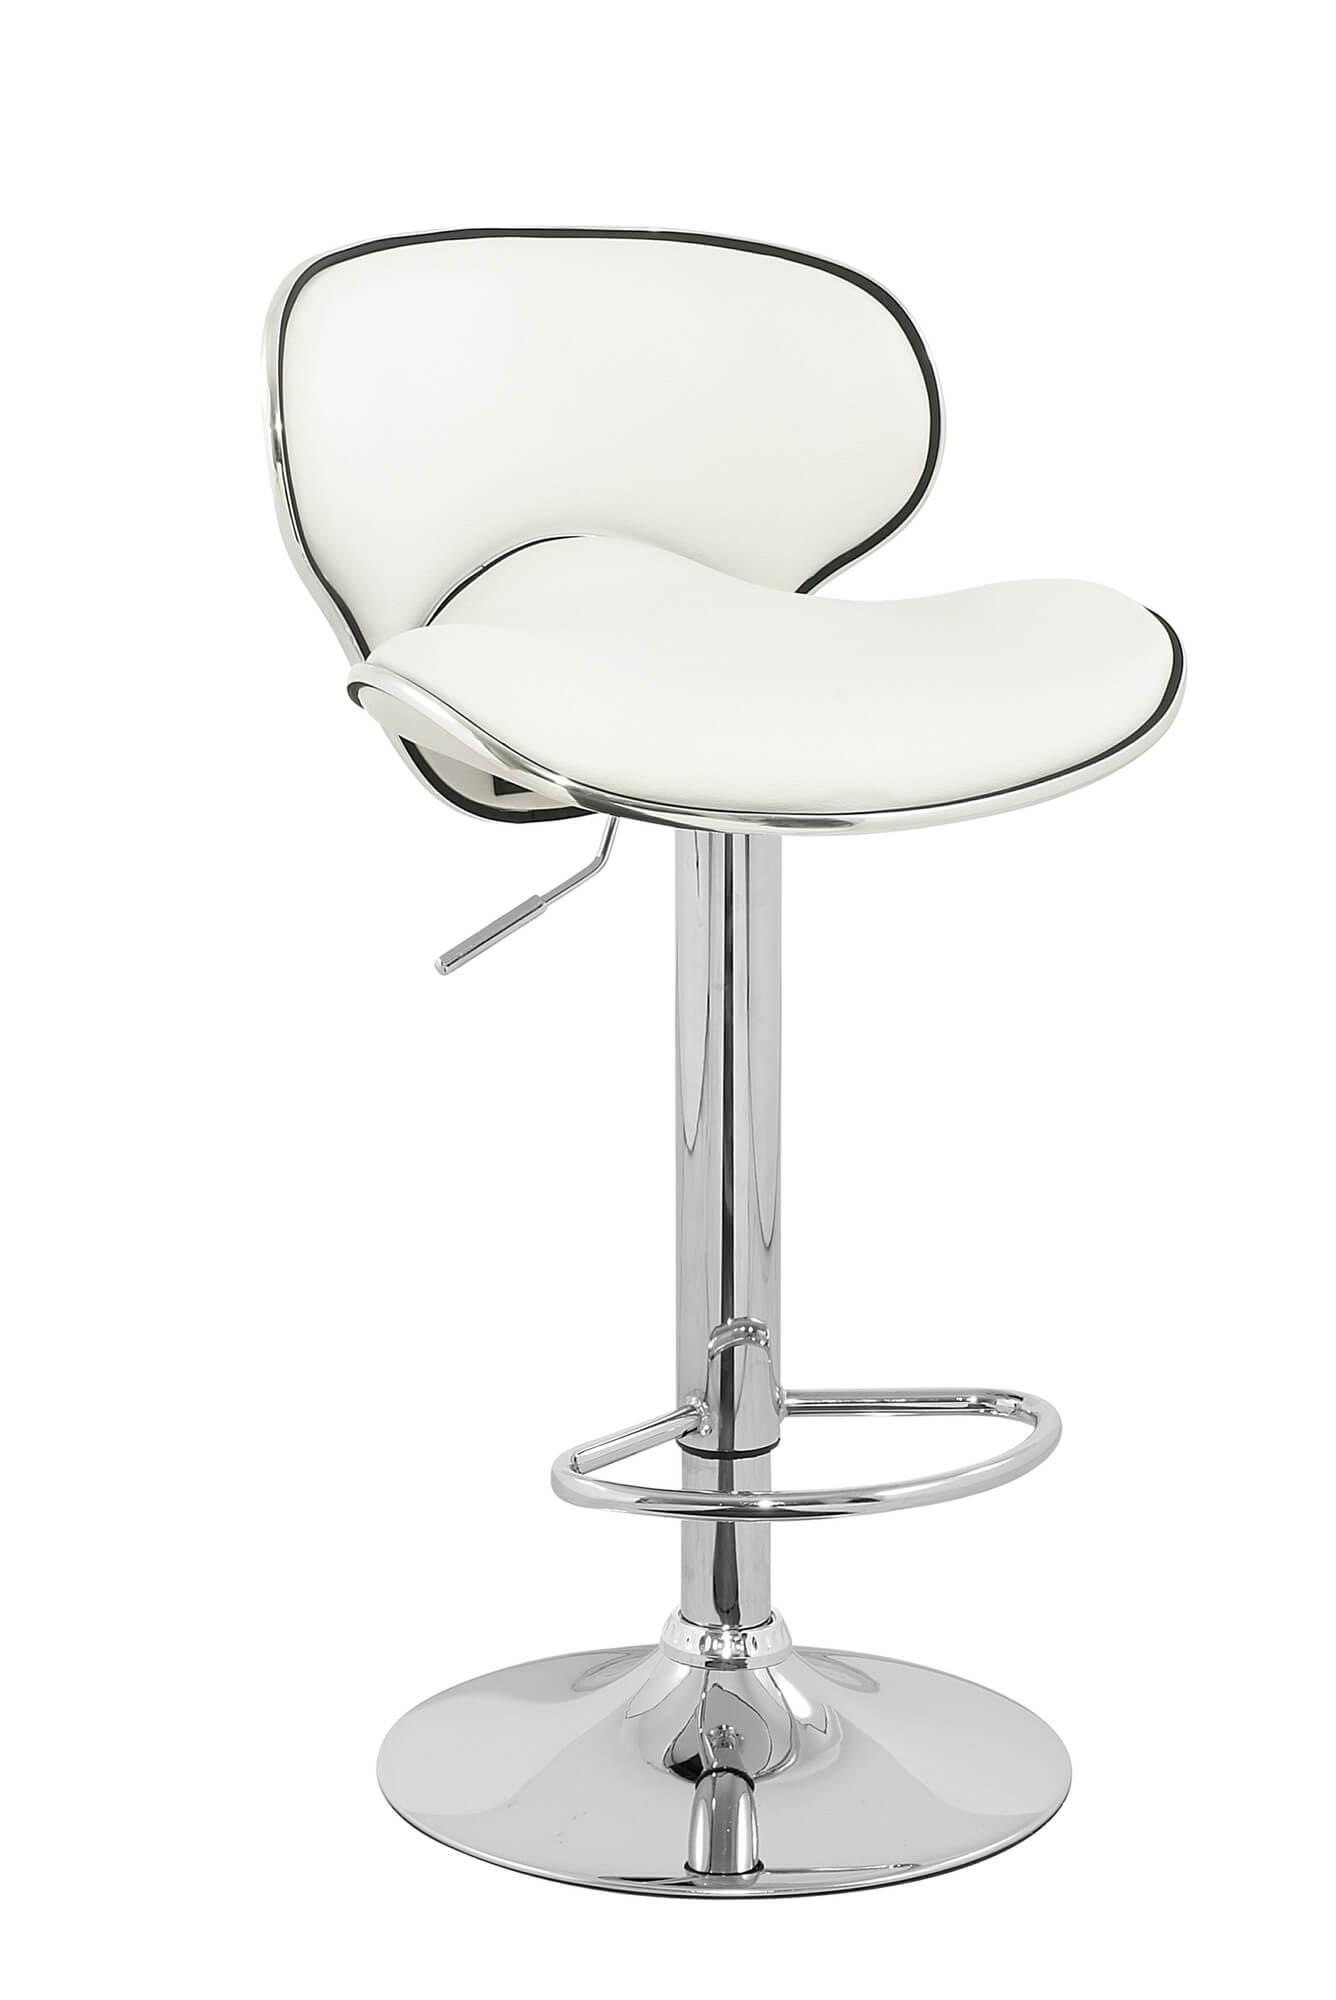 Modern white stool with chrome-finished pedestal base.